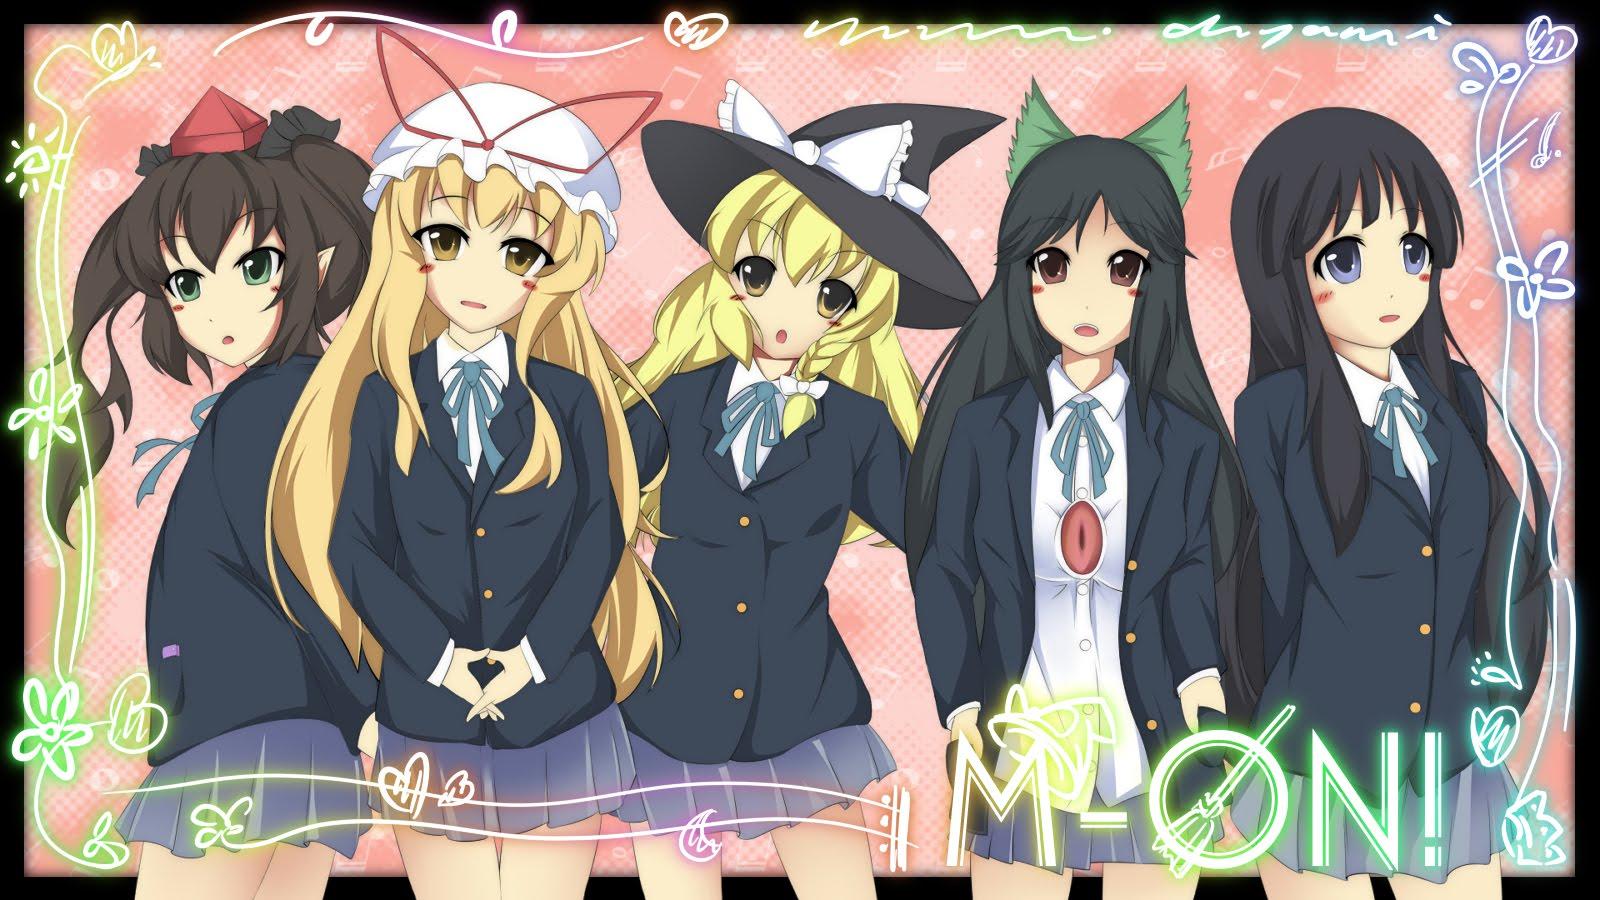 http://2.bp.blogspot.com/_TM0Qm0a6wgE/THMI1B3oWGI/AAAAAAAAEug/j2nJwHoUgHc/s1600/cosplay+himekaidou_hatate+houraisan_kaguya+k-on%21+kirisame_marisa+reiuji_utsuho+seifuku+touhou+yakumo_yukari.jpg